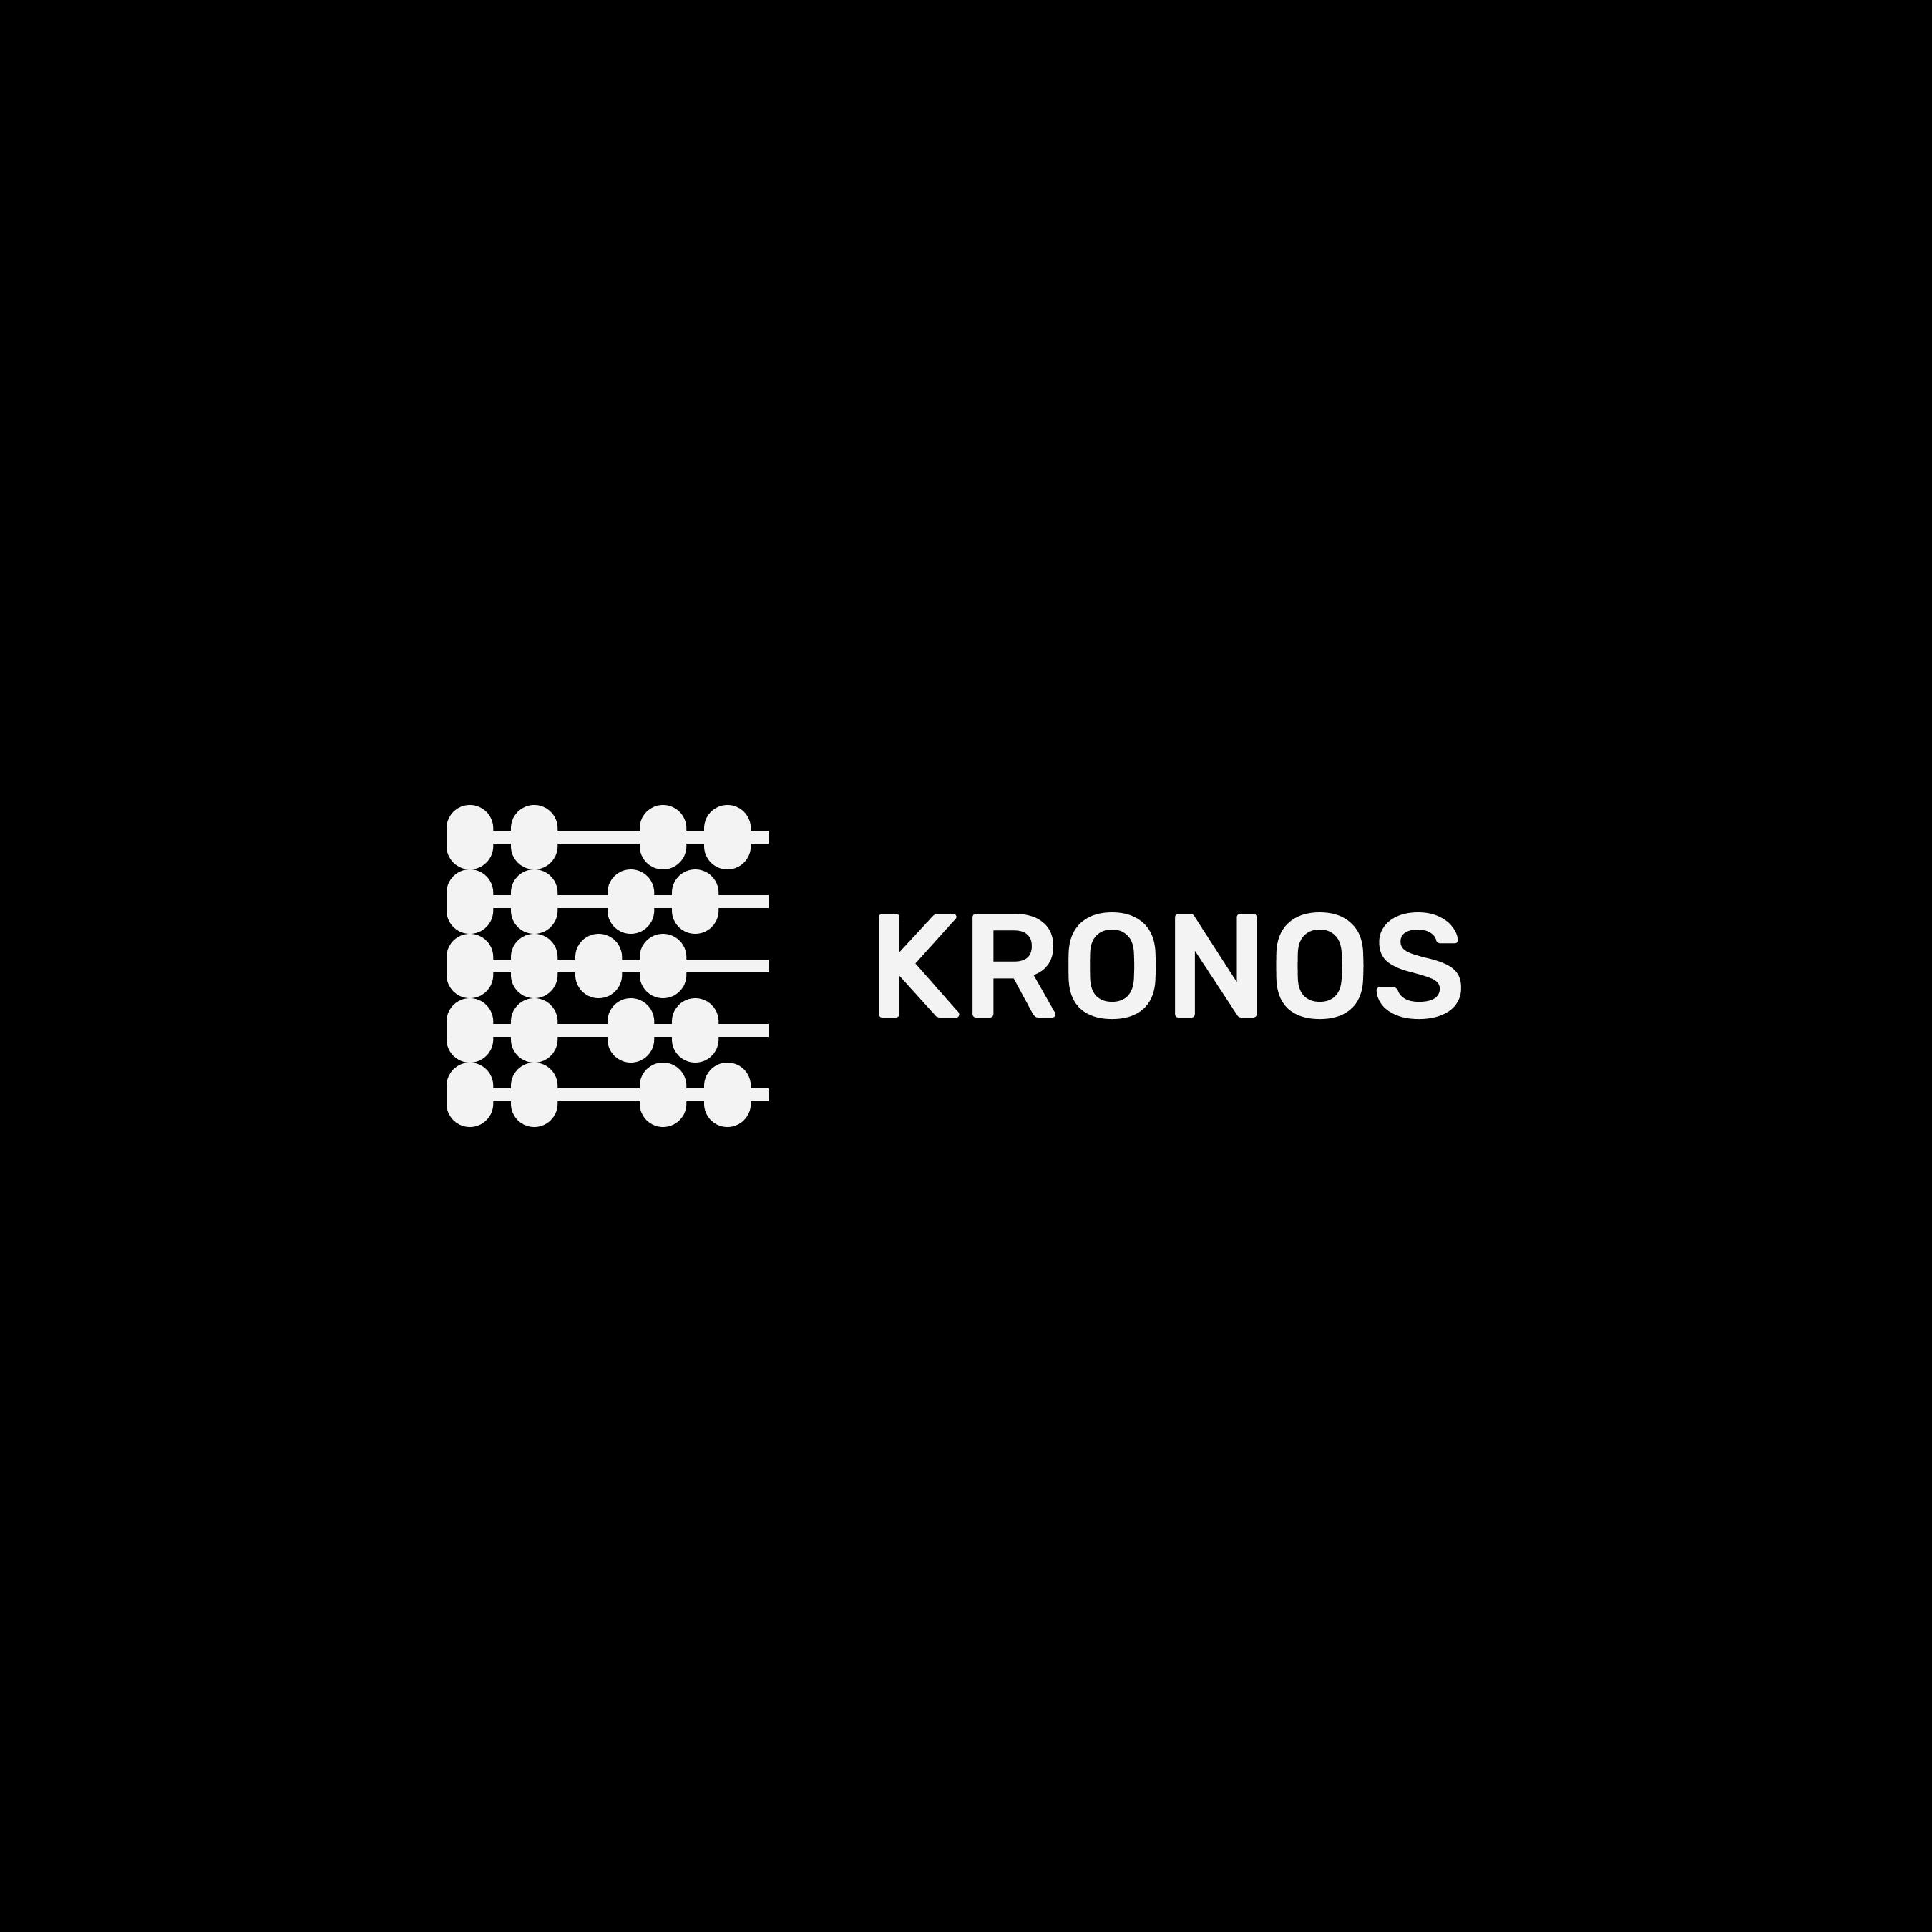 Разработать логотип KRONOS фото f_5355faf14cd64561.png